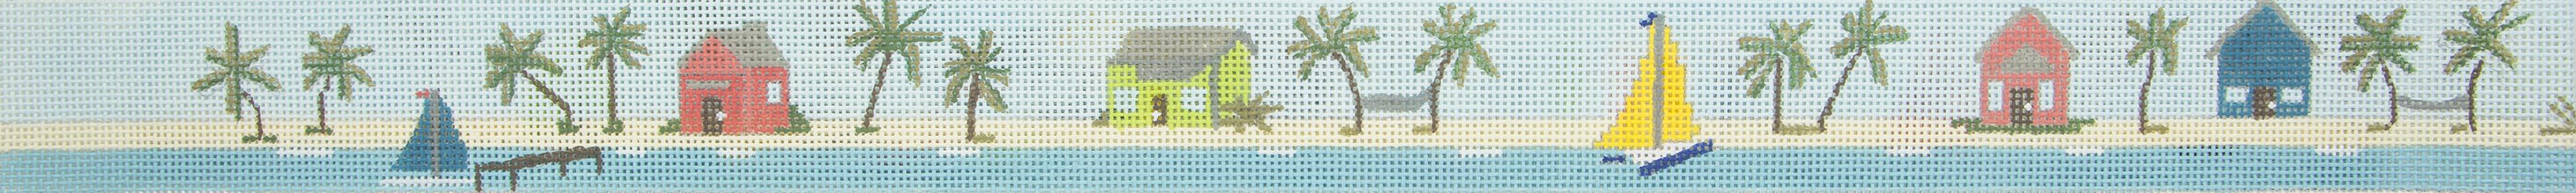 1102 Tropical Island Scene Belt Purple Palm